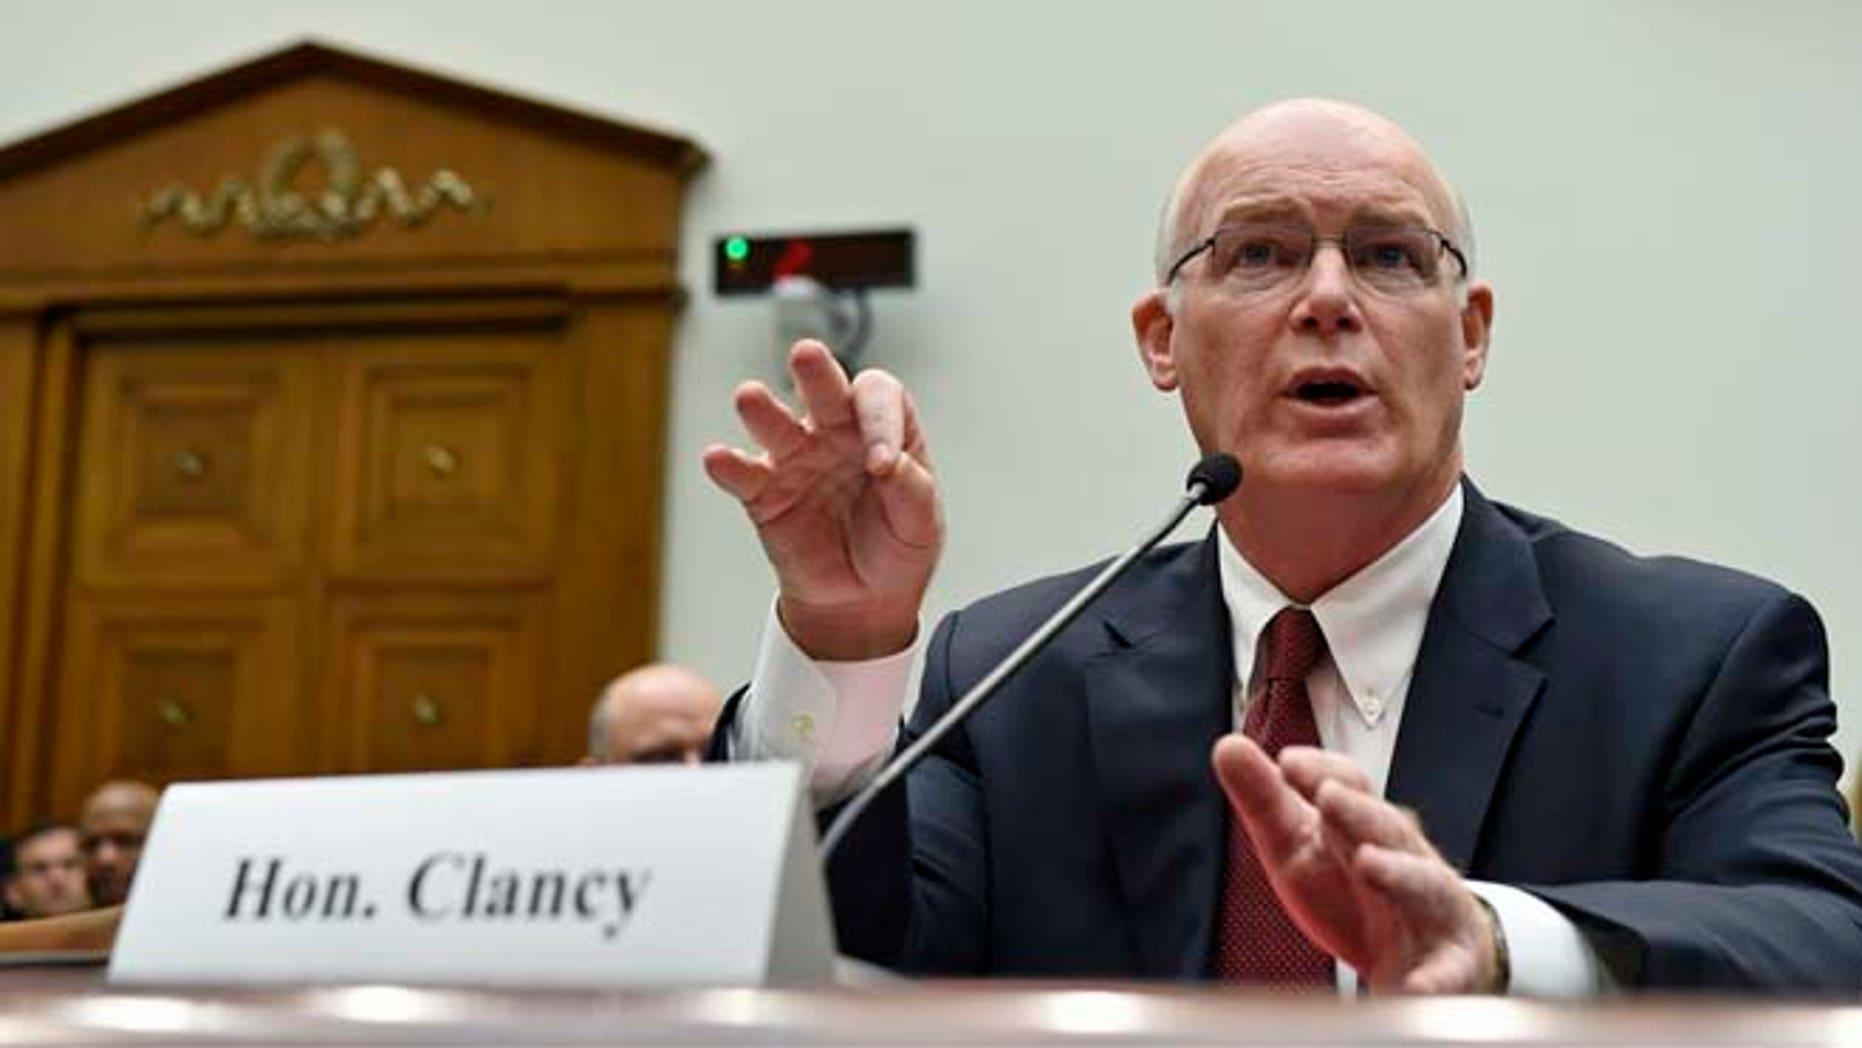 Acting Secret Service Director Joseph Clancy testifies on Capitol Hill in Washington, Wednesday, Nov. 19, 2014.